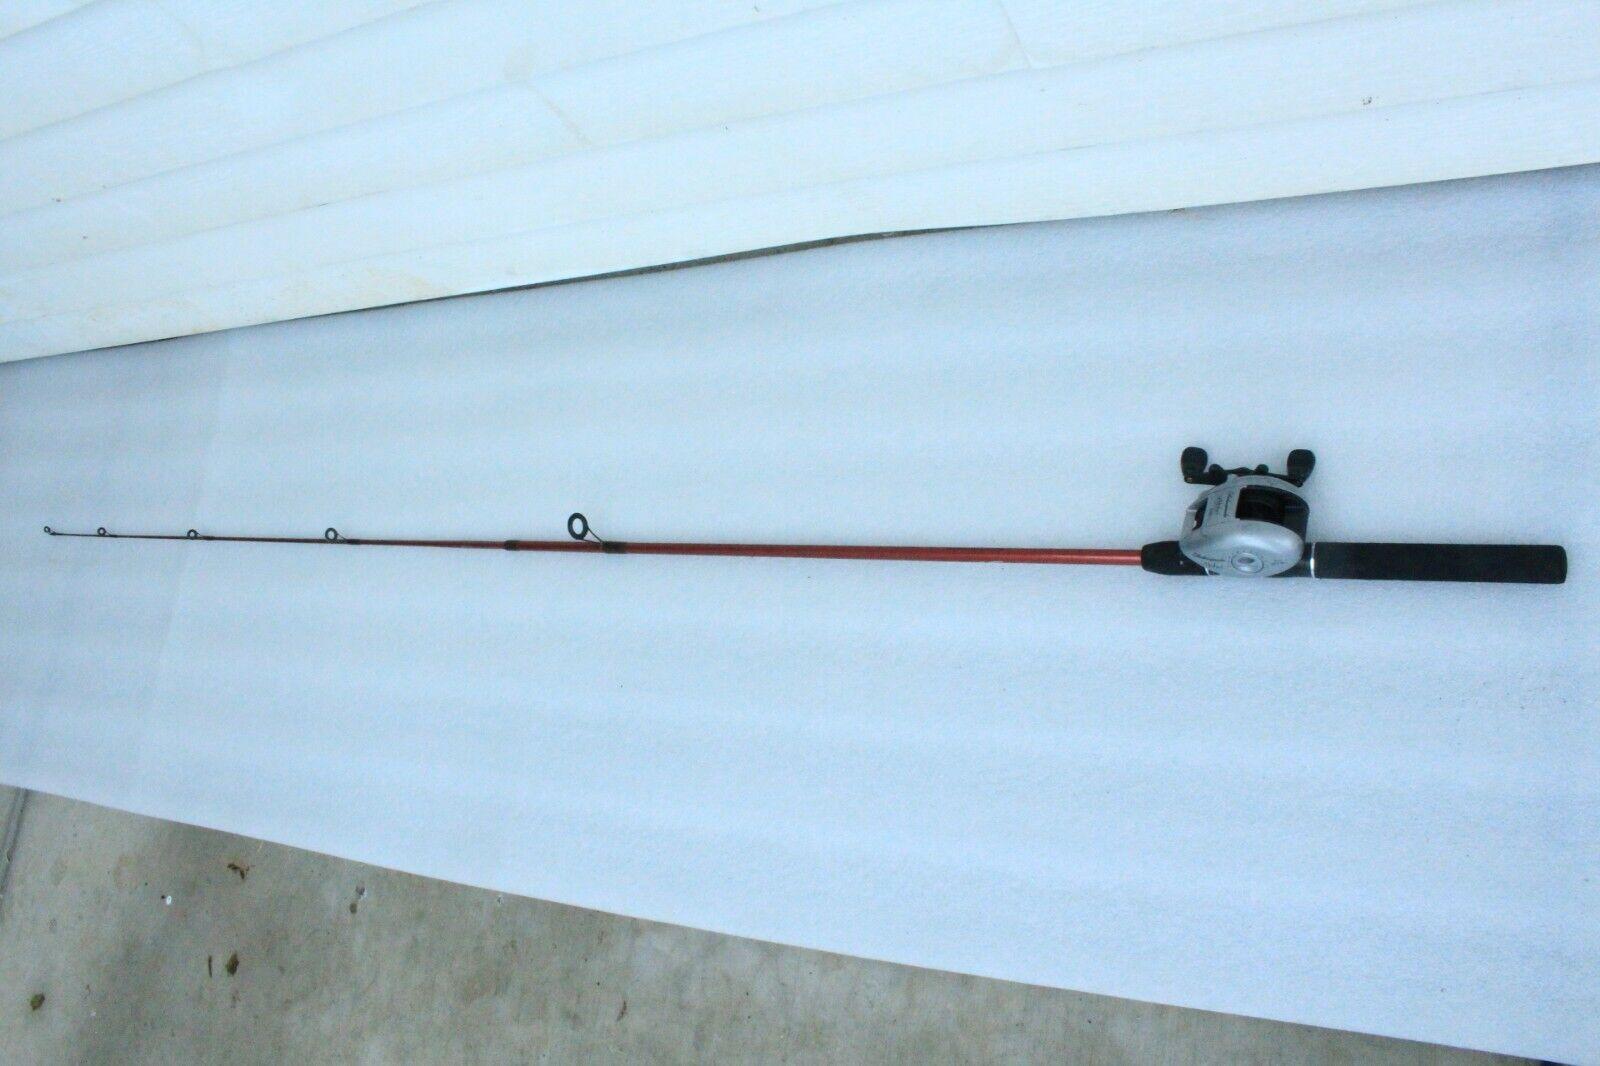 South Bend SR100 335 6' 6-14 Fishing Rod Shakespeare Alpha 310 Baitcasting Reel